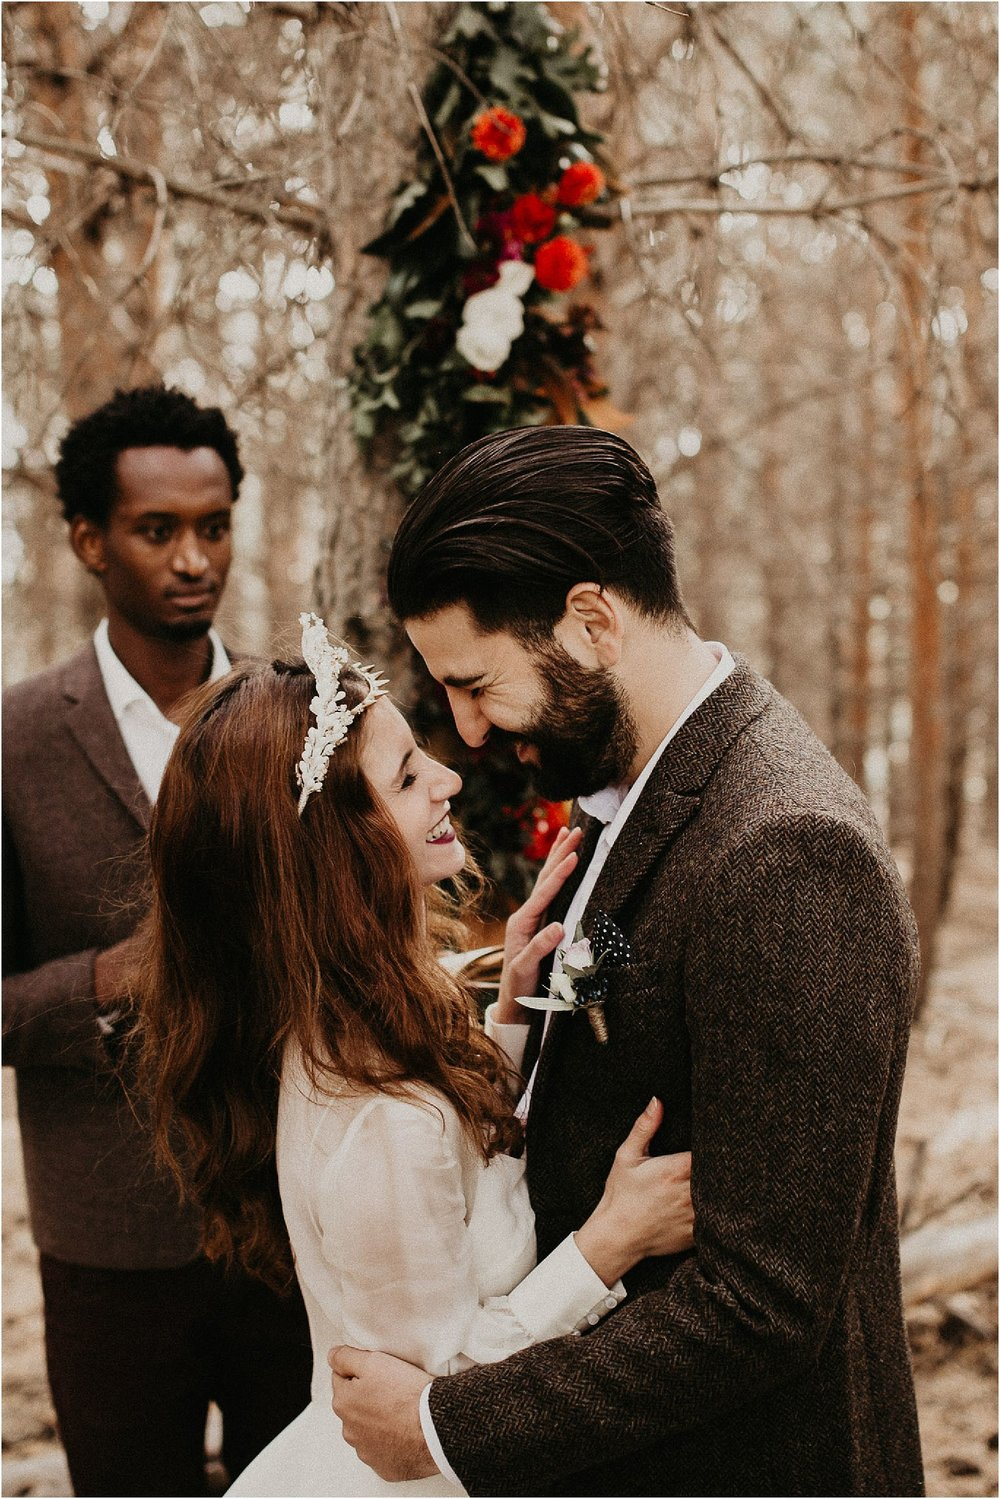 Intimate folk wedding 37.jpg